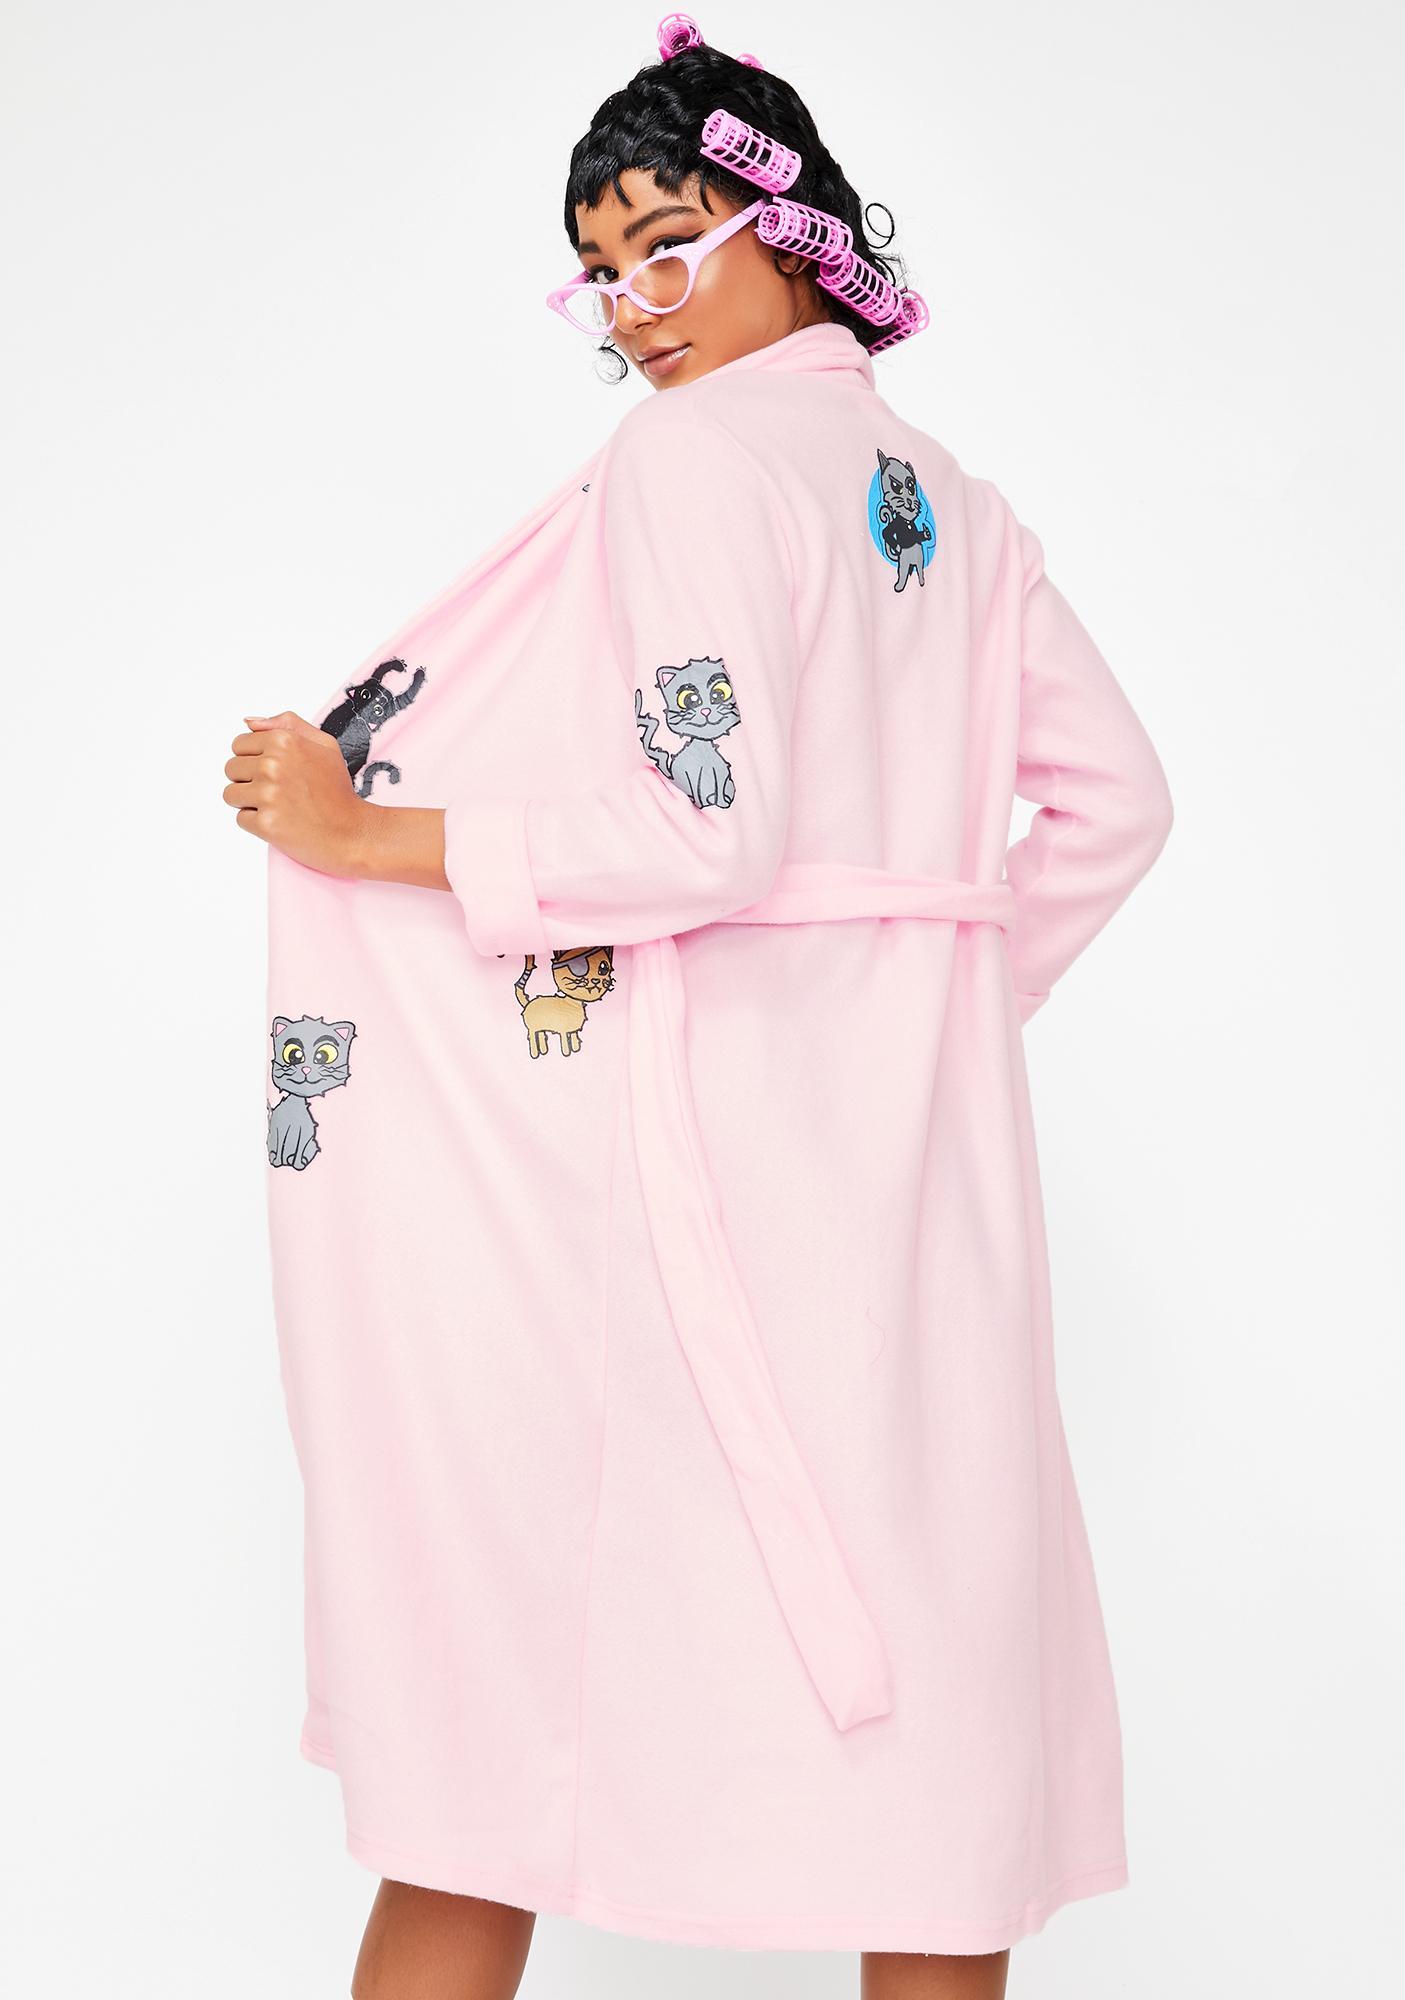 Sourpuss Crazy Cat Lady Costume